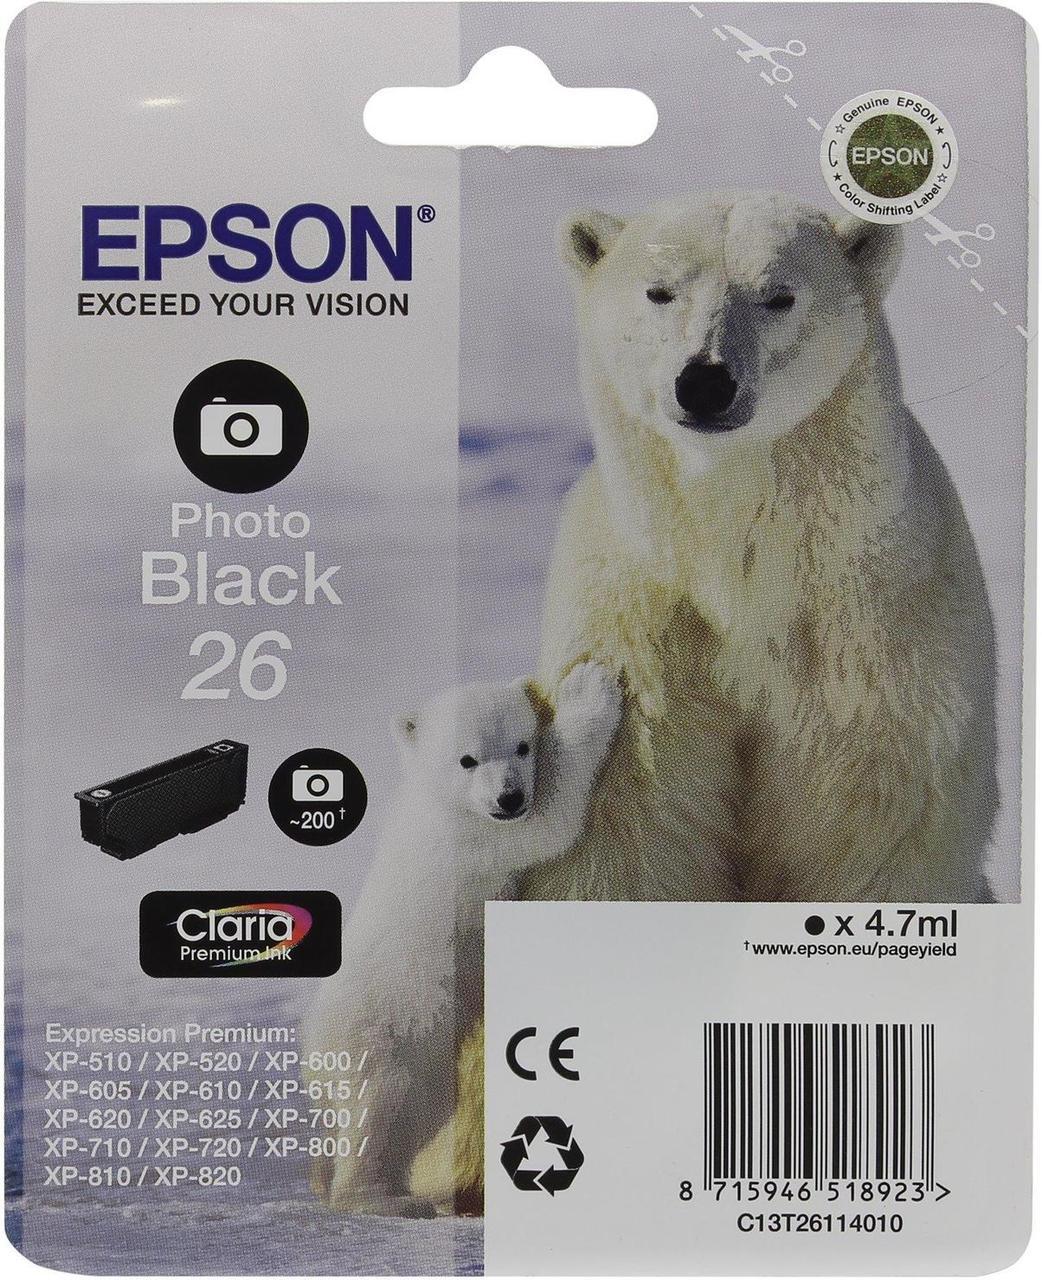 Картридж Epson C13T26114012 XP600/7/8 (Photo Black, 200 стр)